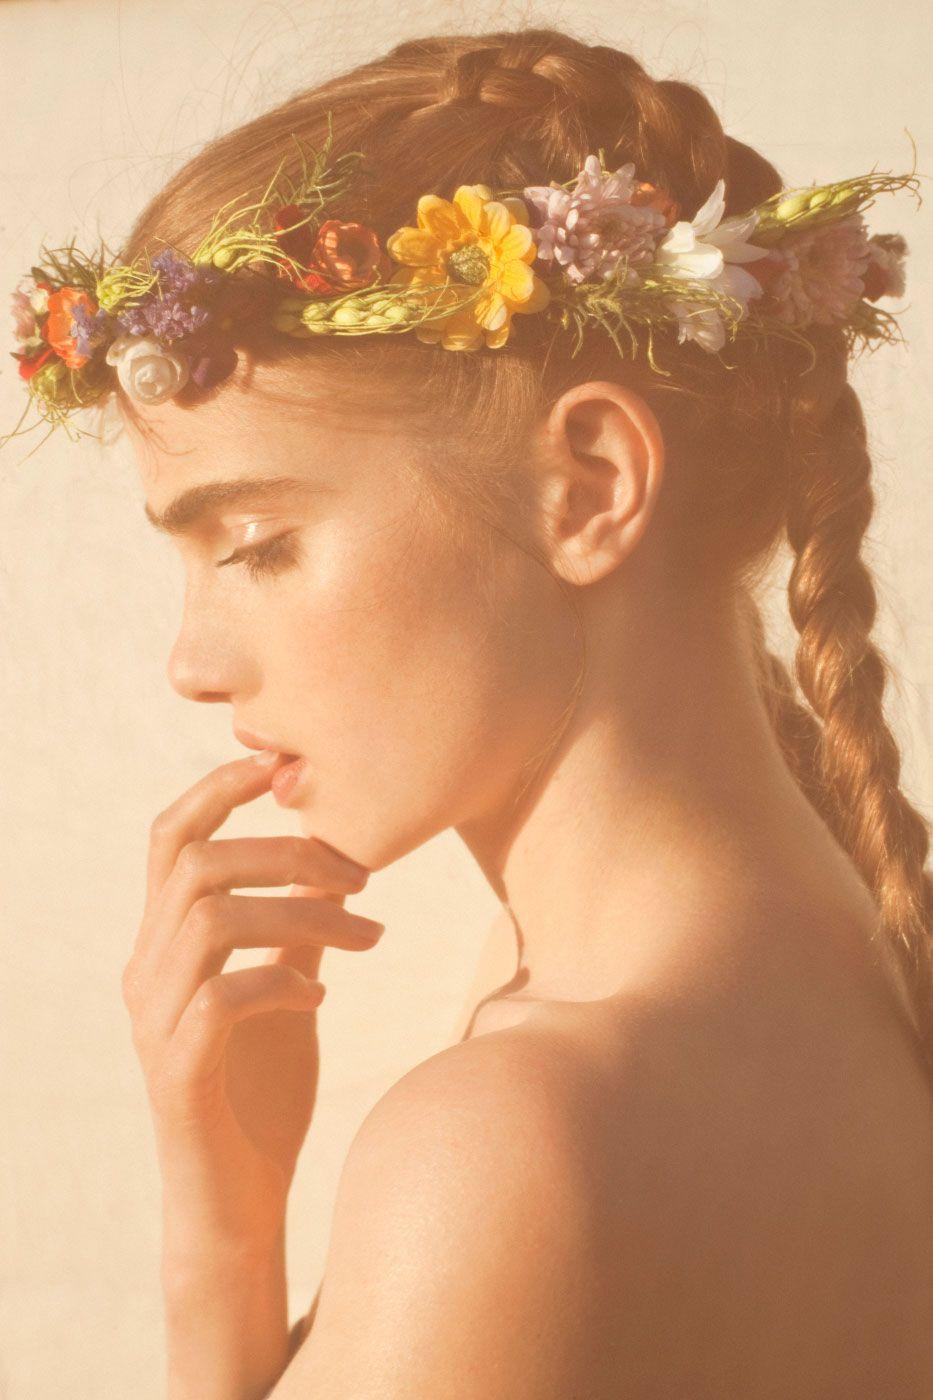 flower in her hair - photo #1